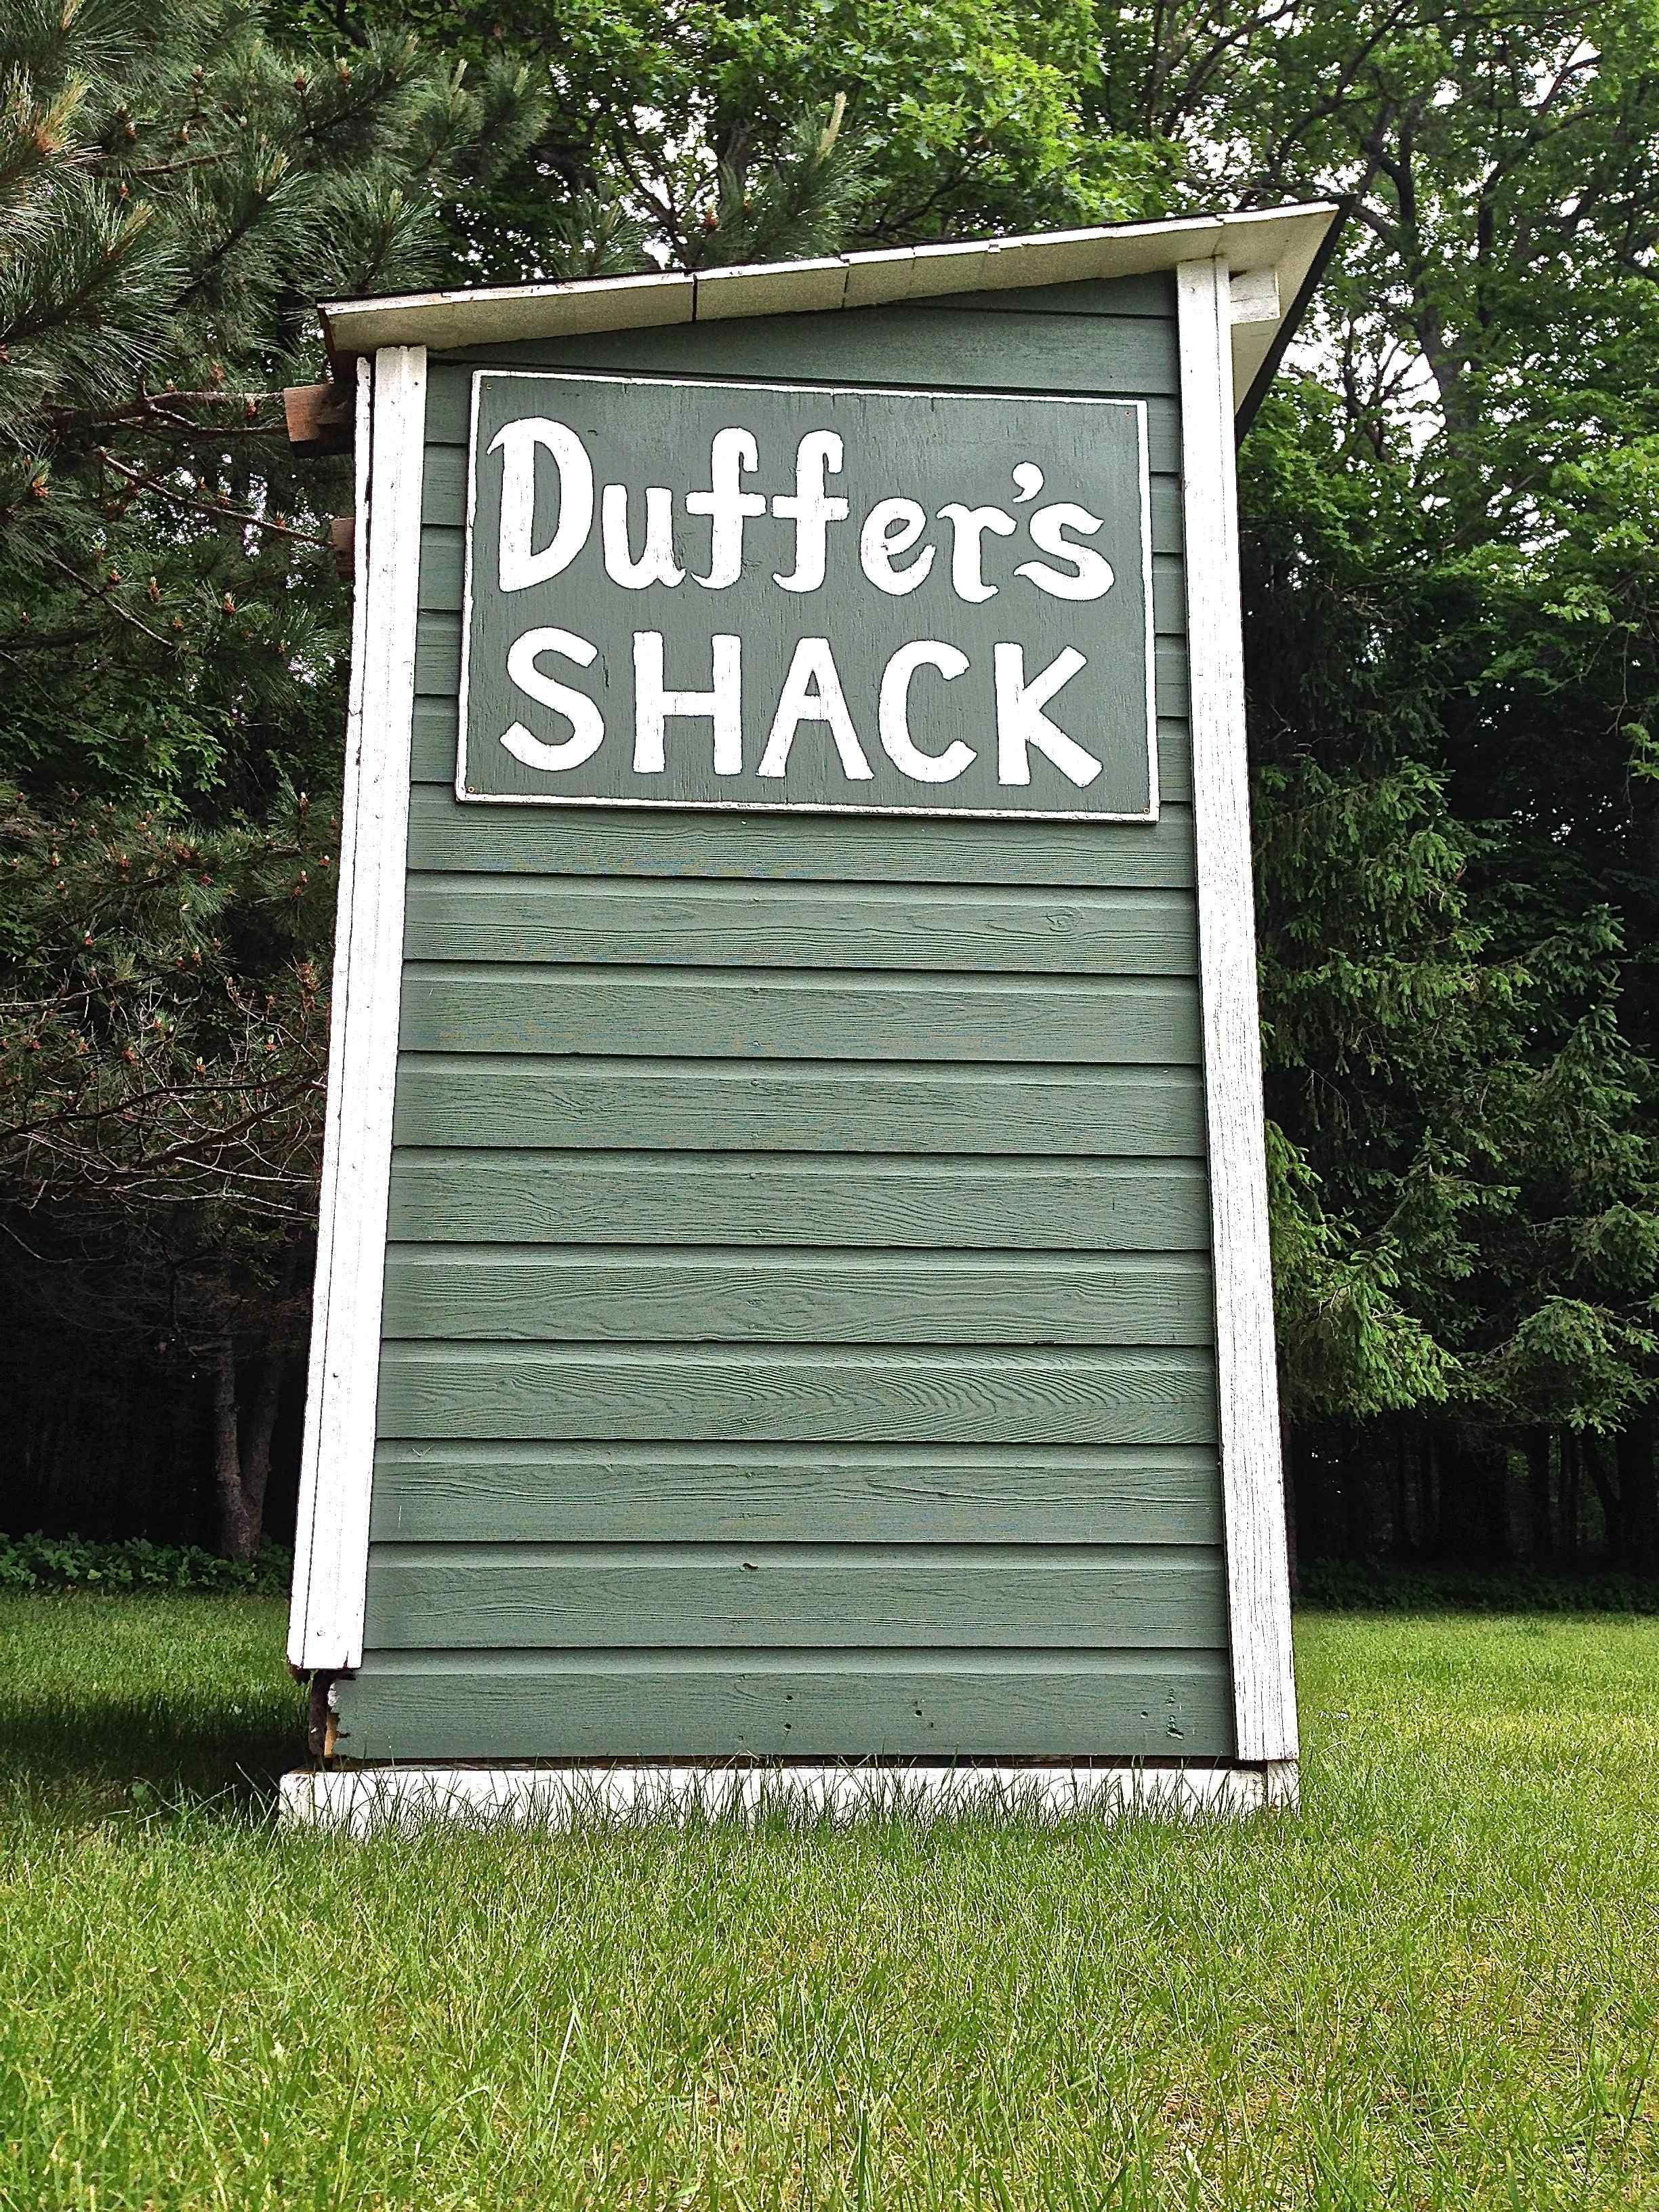 DufferShack.jpg